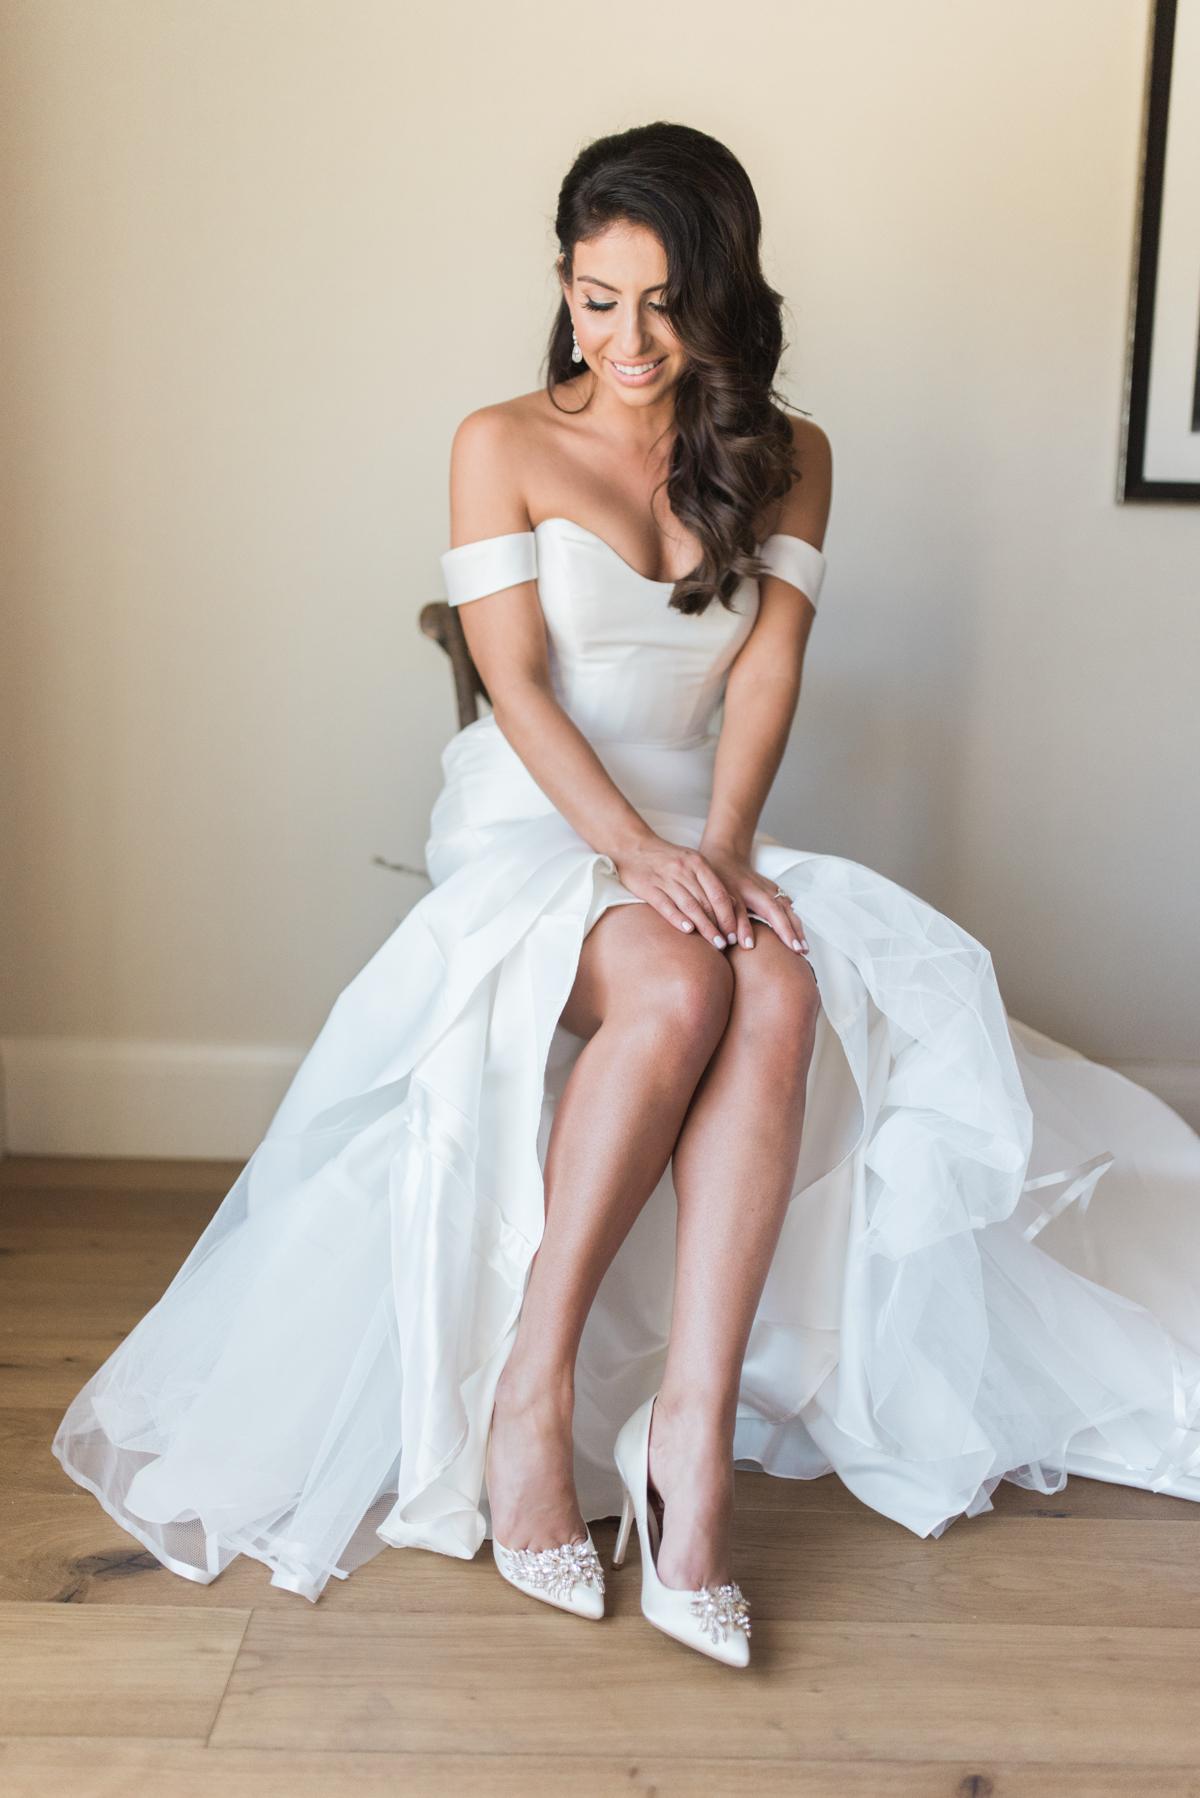 Blog Roxy Farbod Rolling Hills Country Club Wedding Sneaks _ Hello Blue Photo-17